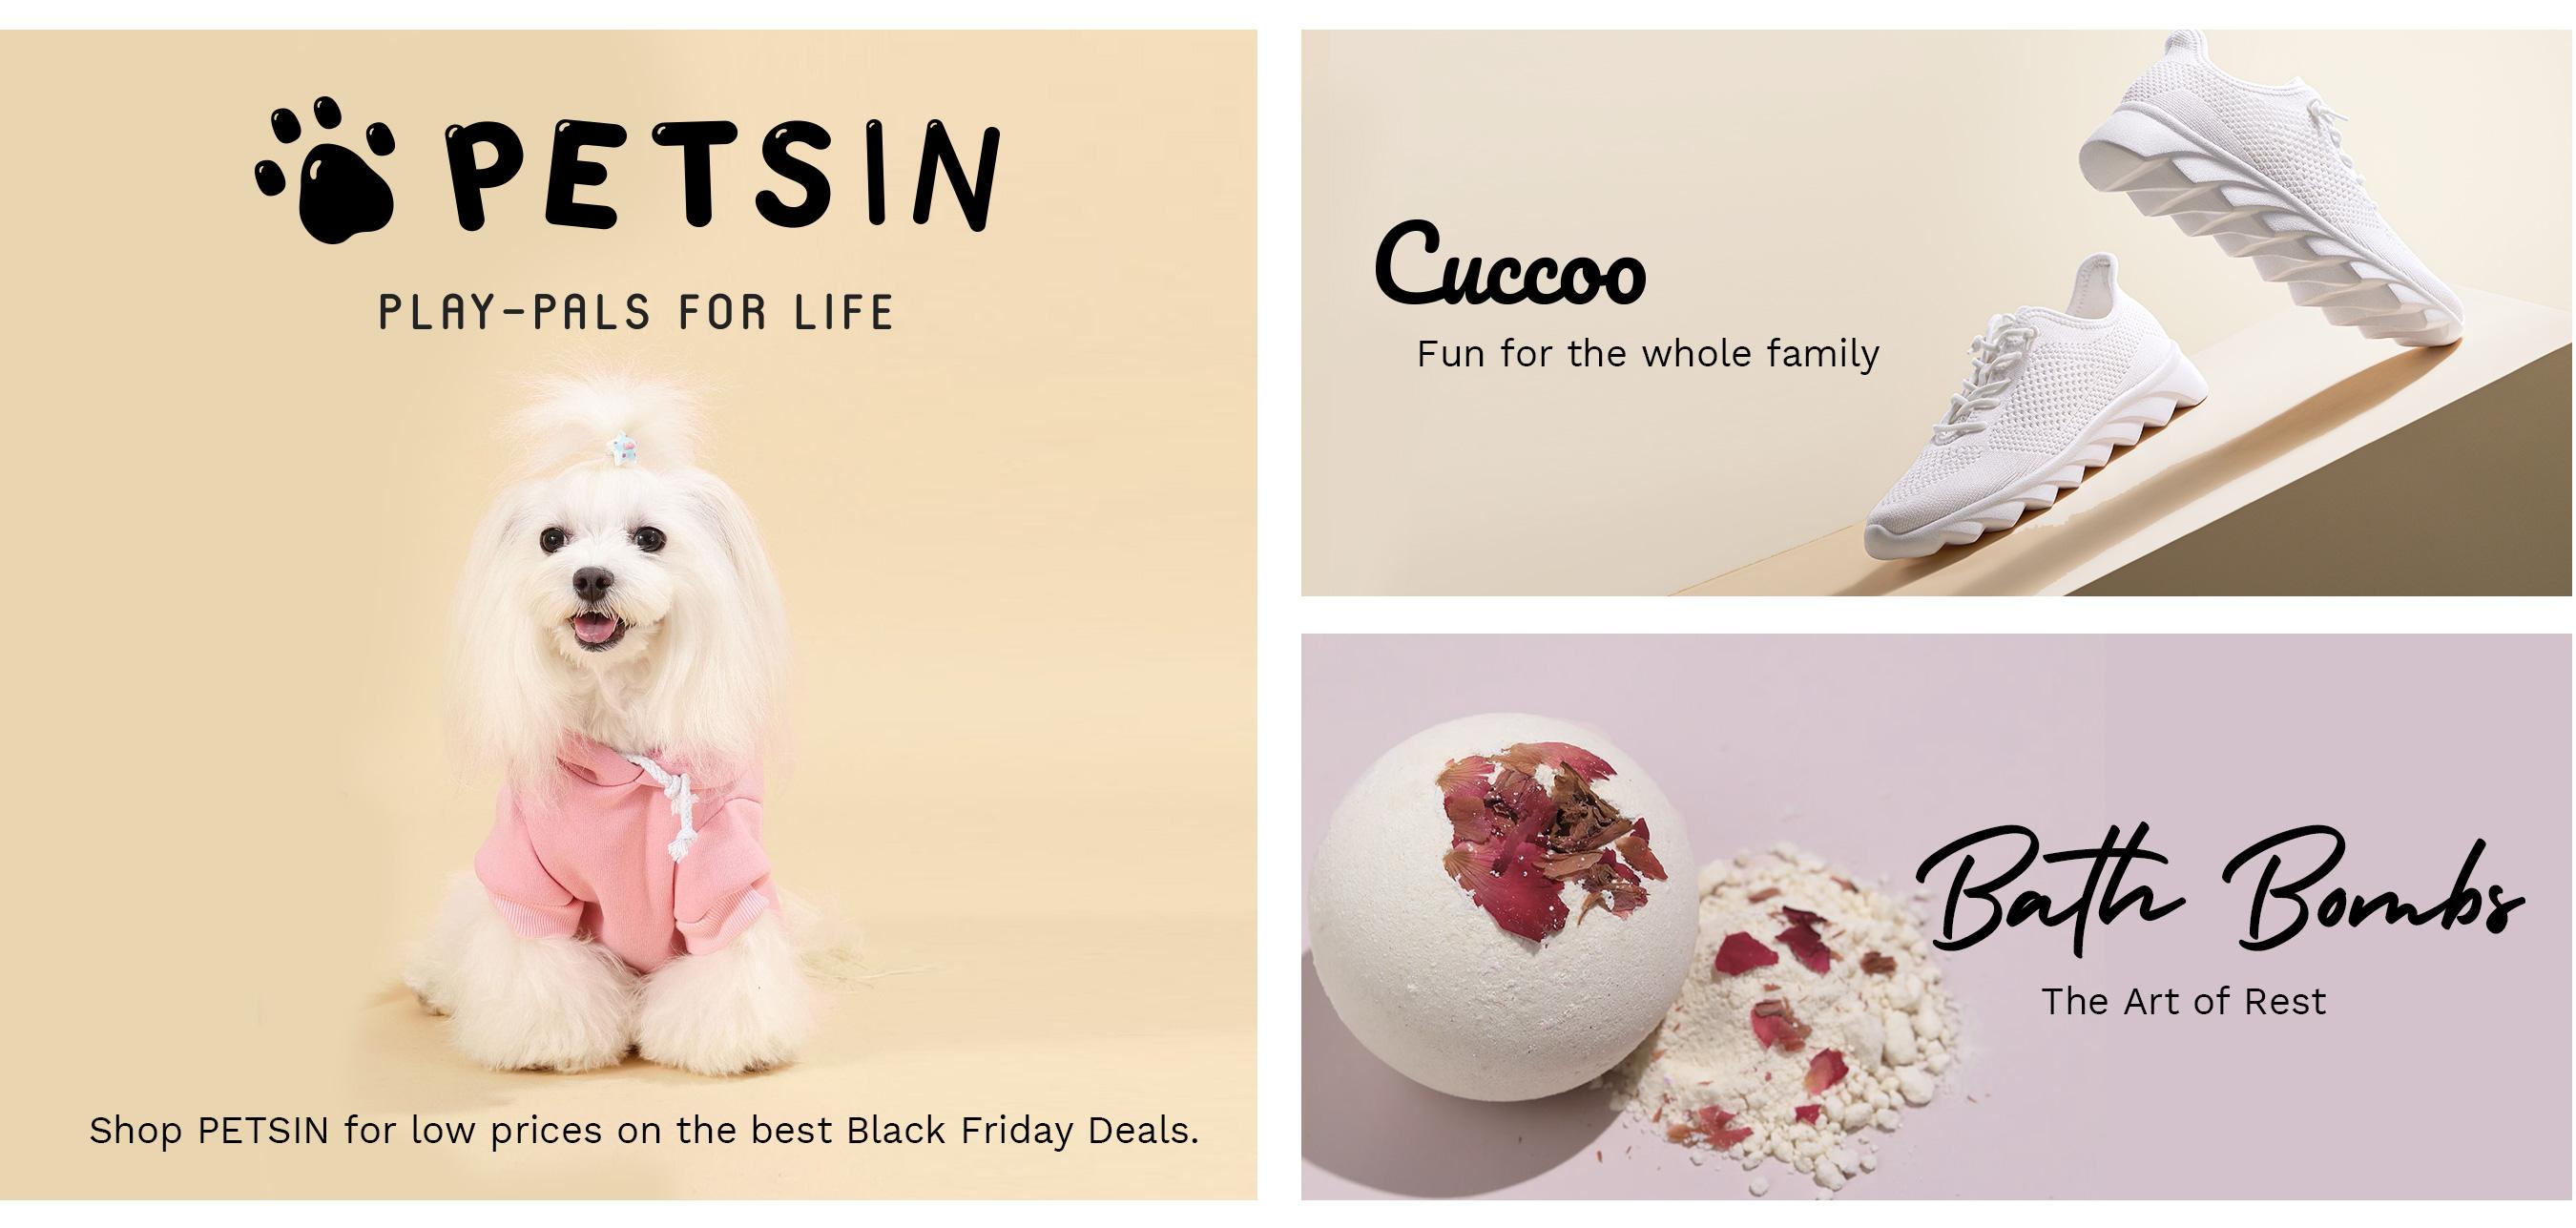 Shein Coupons - Pet Supplies starting at just $3.50